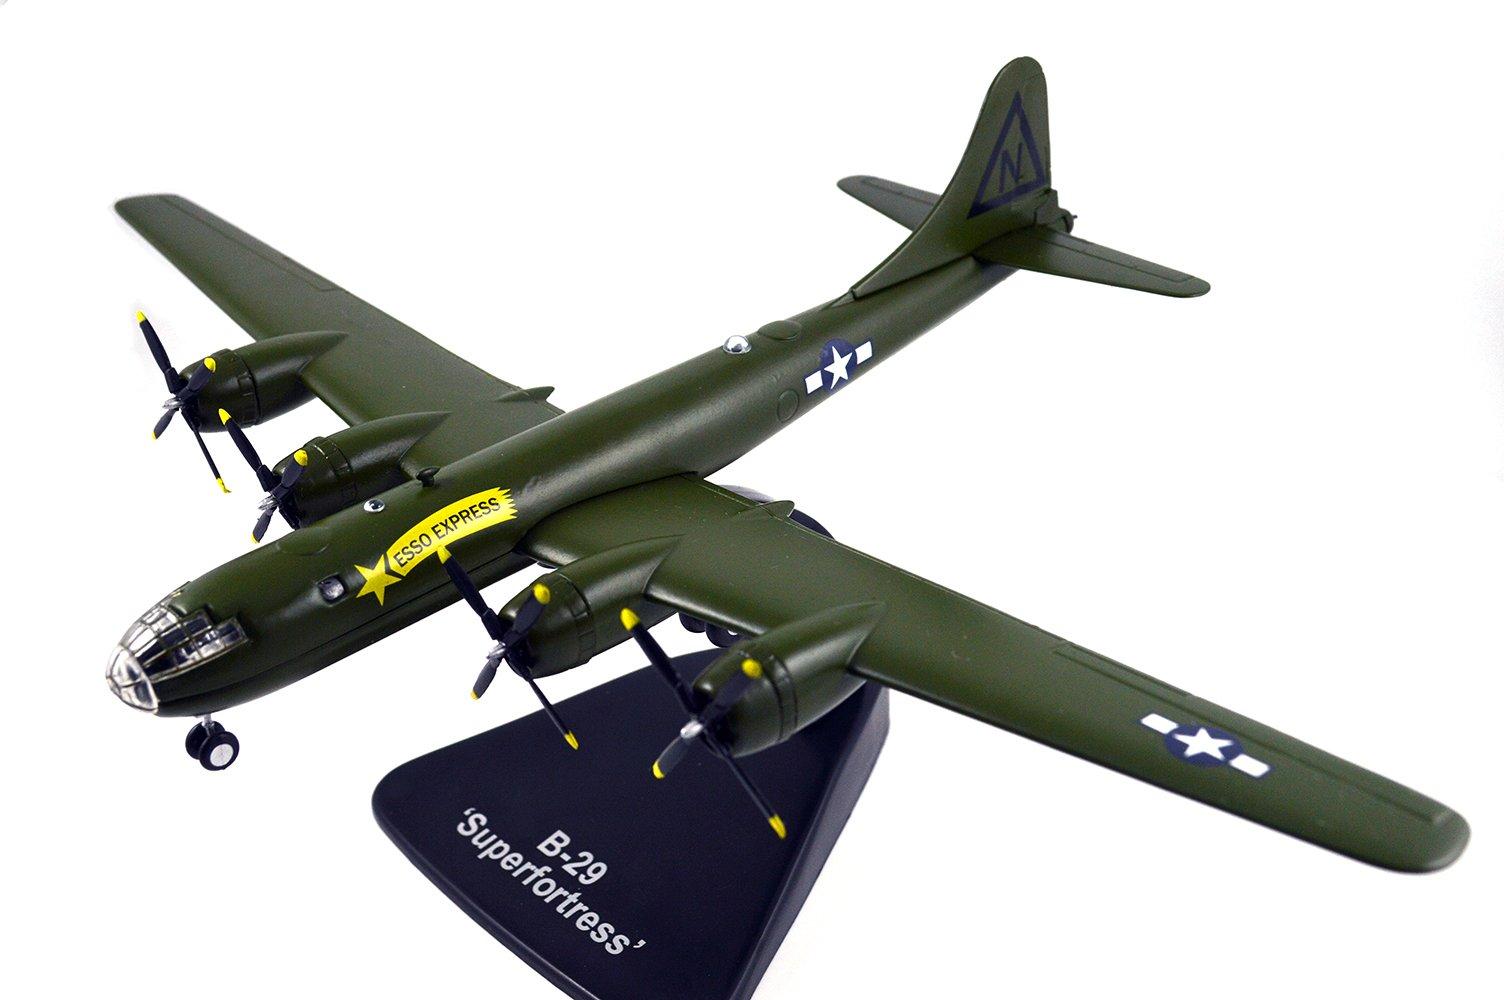 FLOZ USA SUPERFORTRESS B-29 Aircraft 1:144 die cast Plane Pre-Assembled Model Vehicle